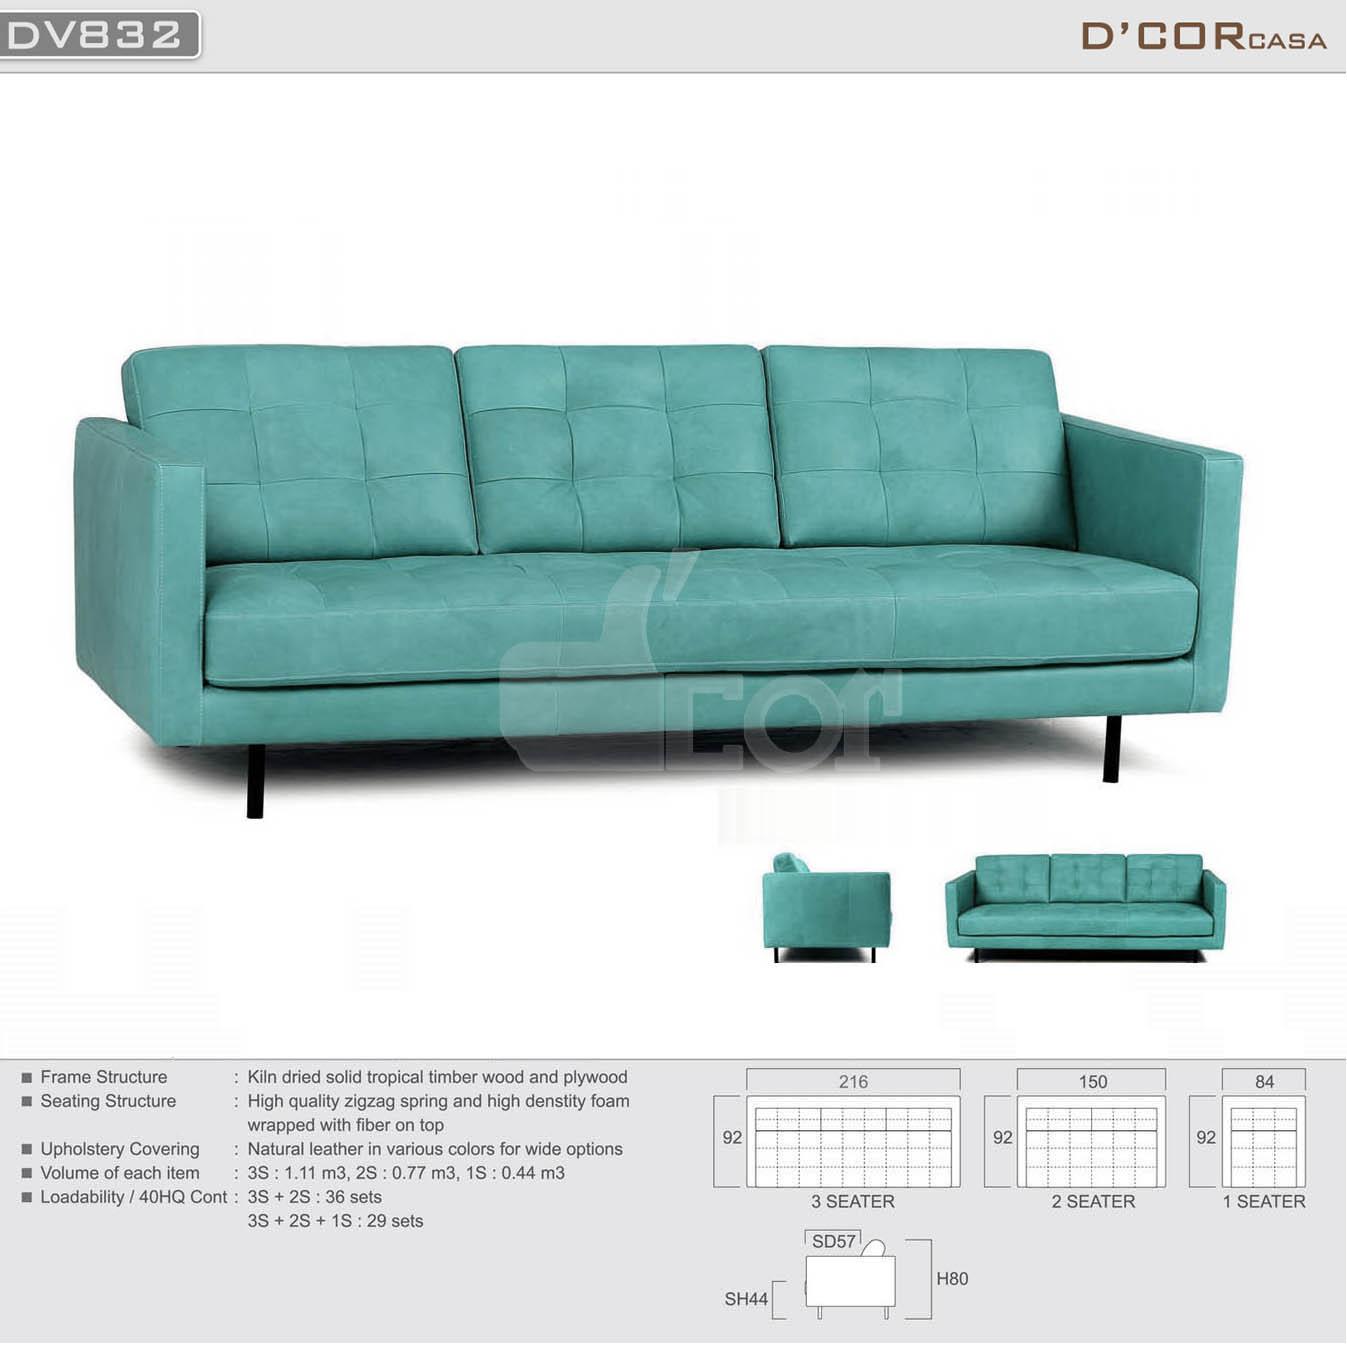 Sofa Malaysia da thật đẹp hoàn hảo DV832